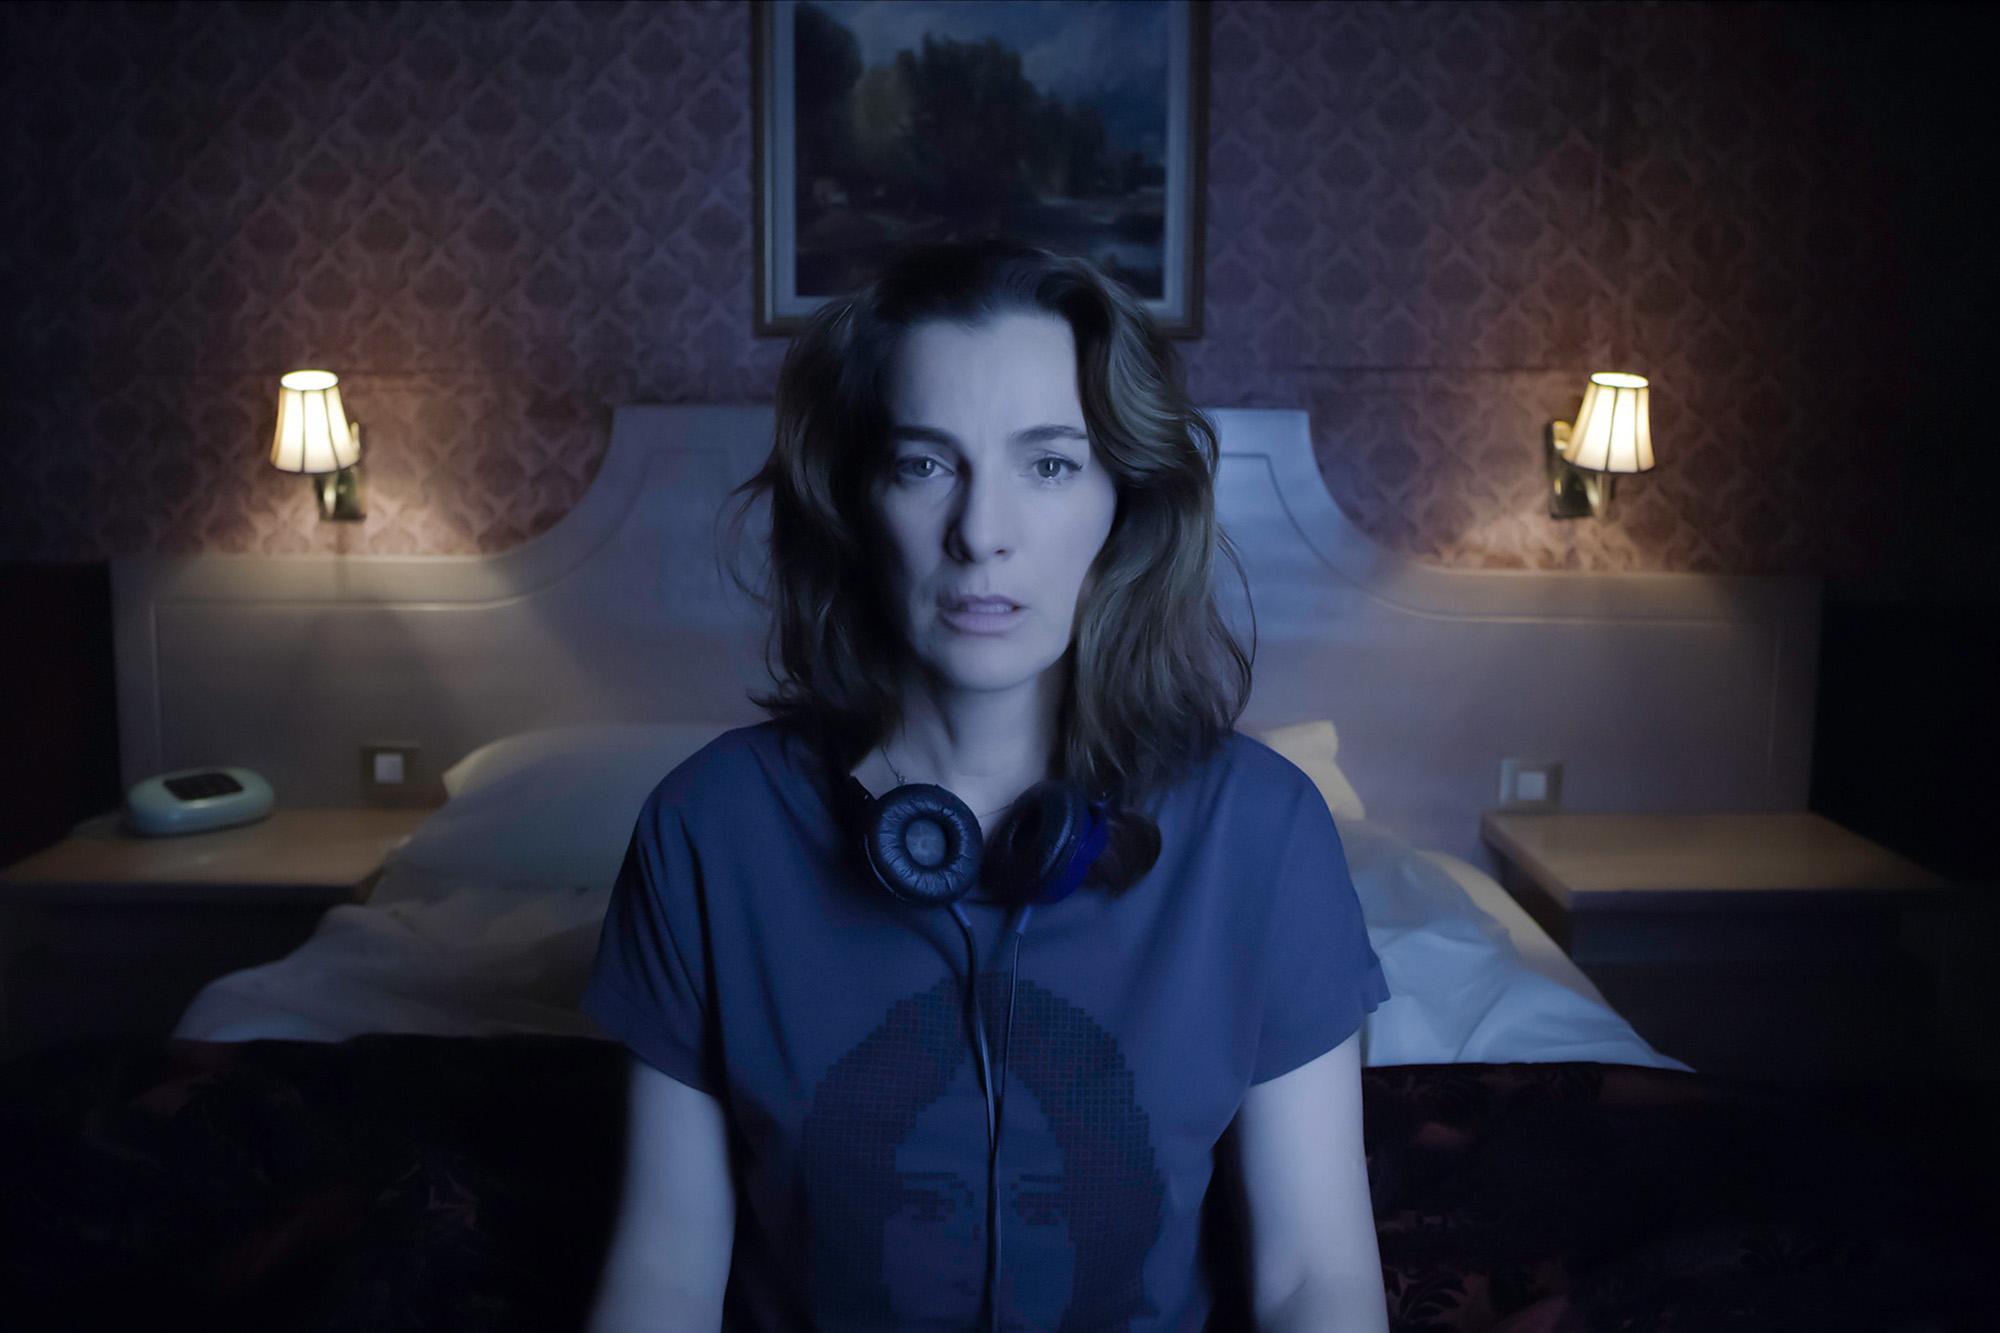 'Losing Alice' star Ayelet Zurer dishes on wild role